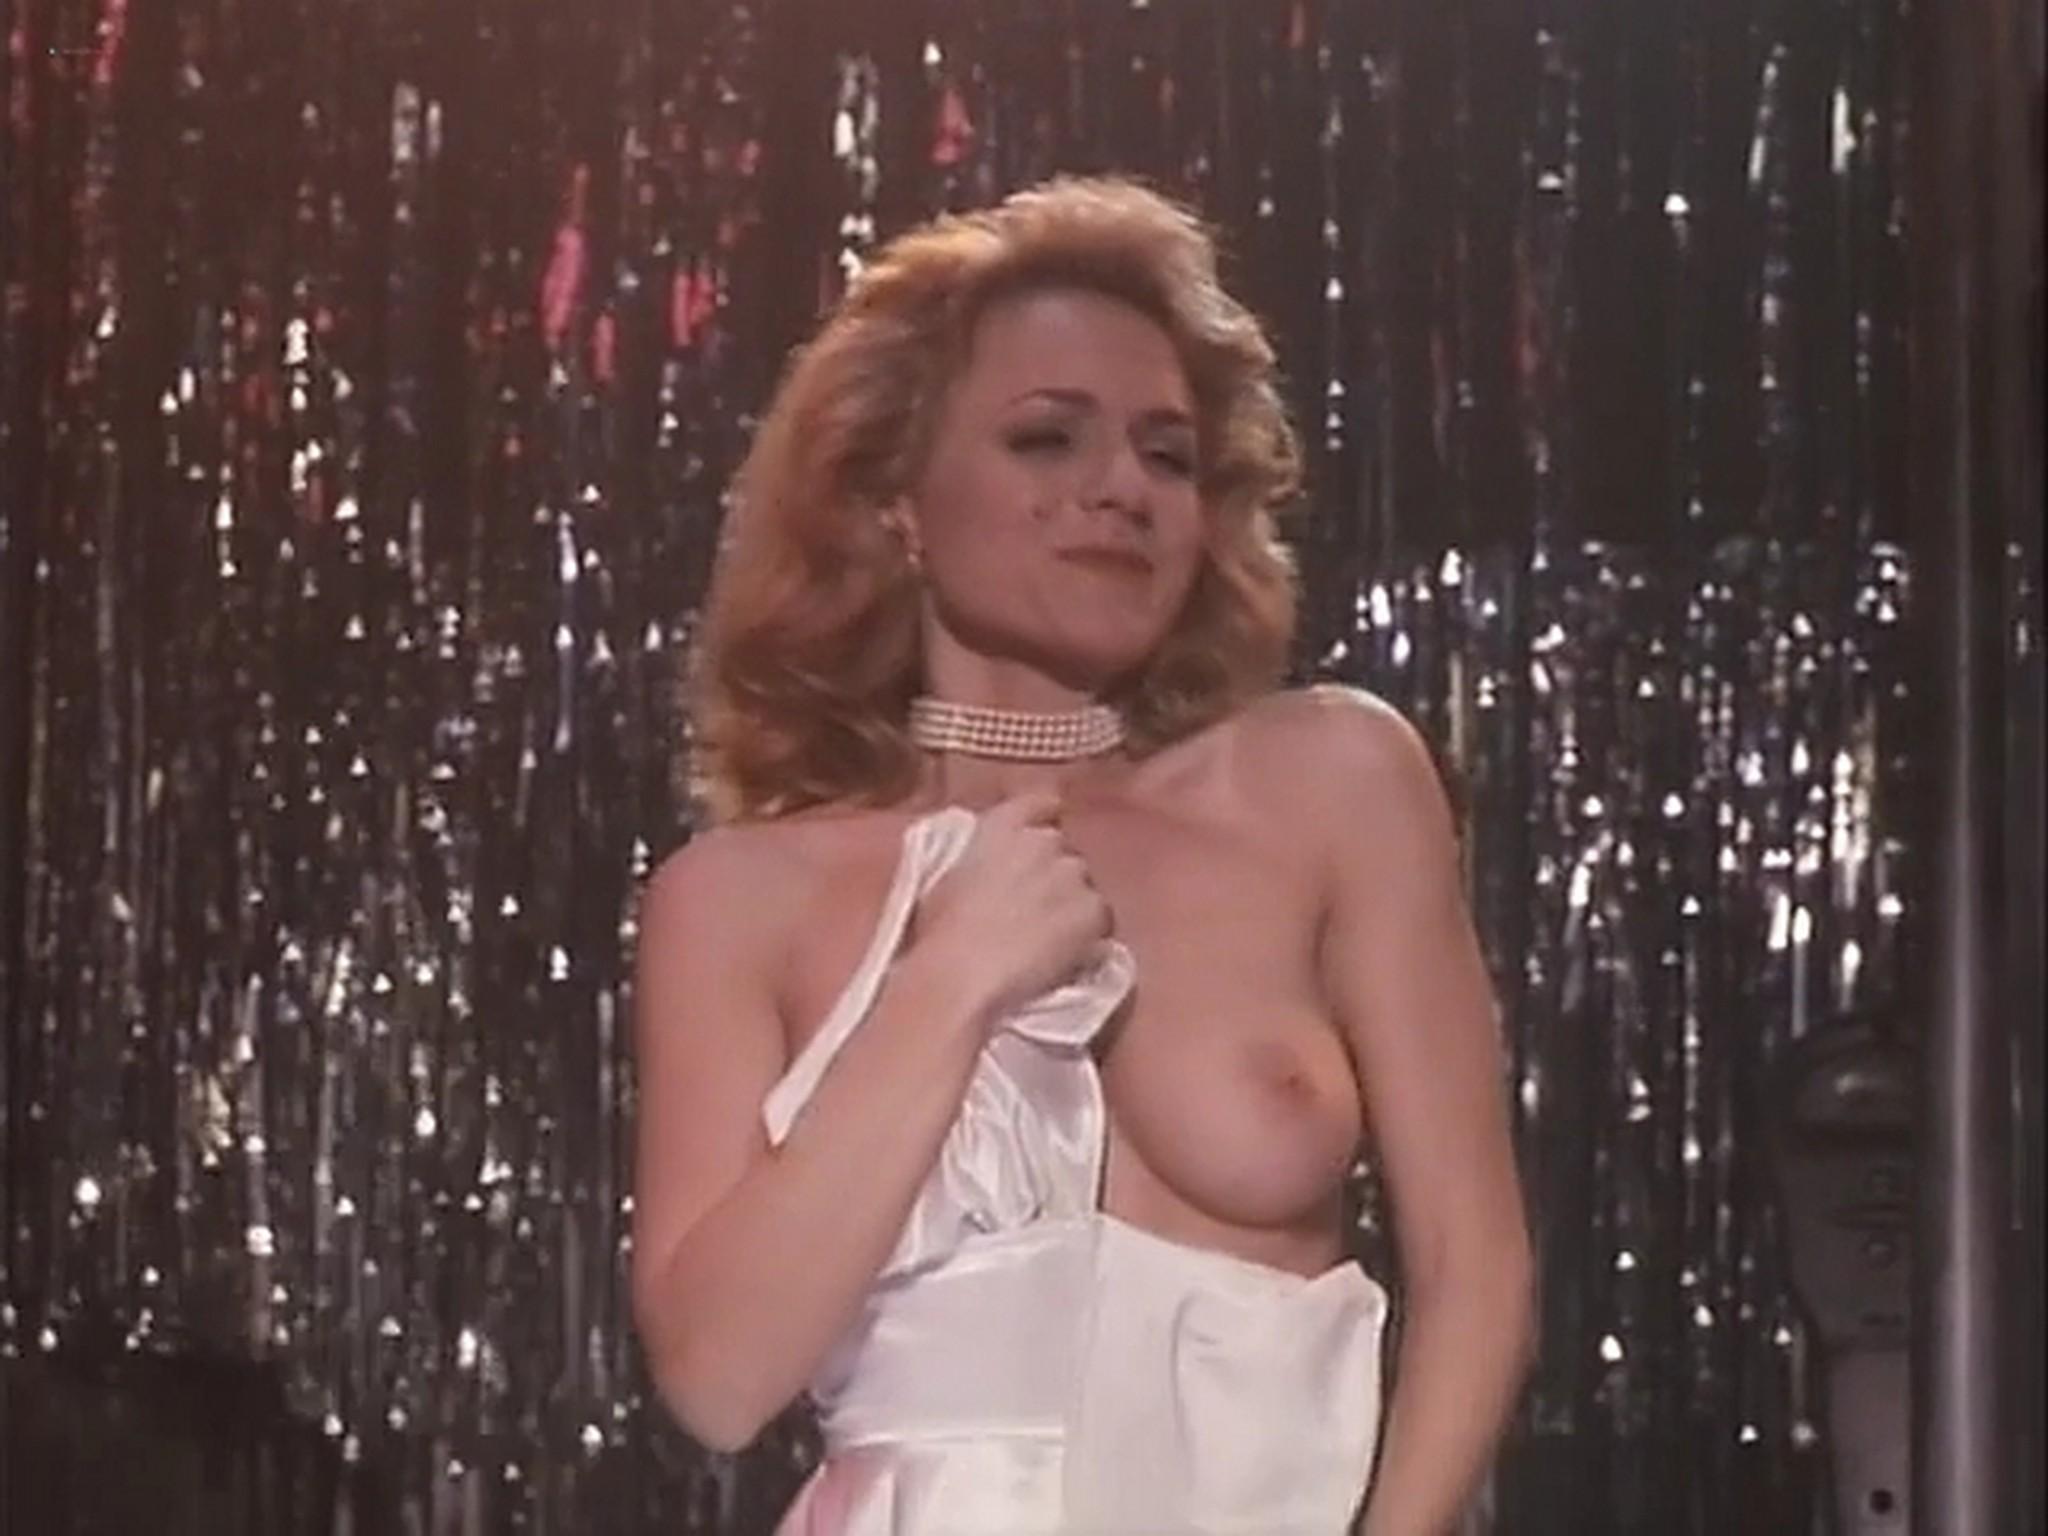 Barbara Alyn Woods nude Catya Sassoon Jill Pierce nude too as strippers Dance with Death 1991 16